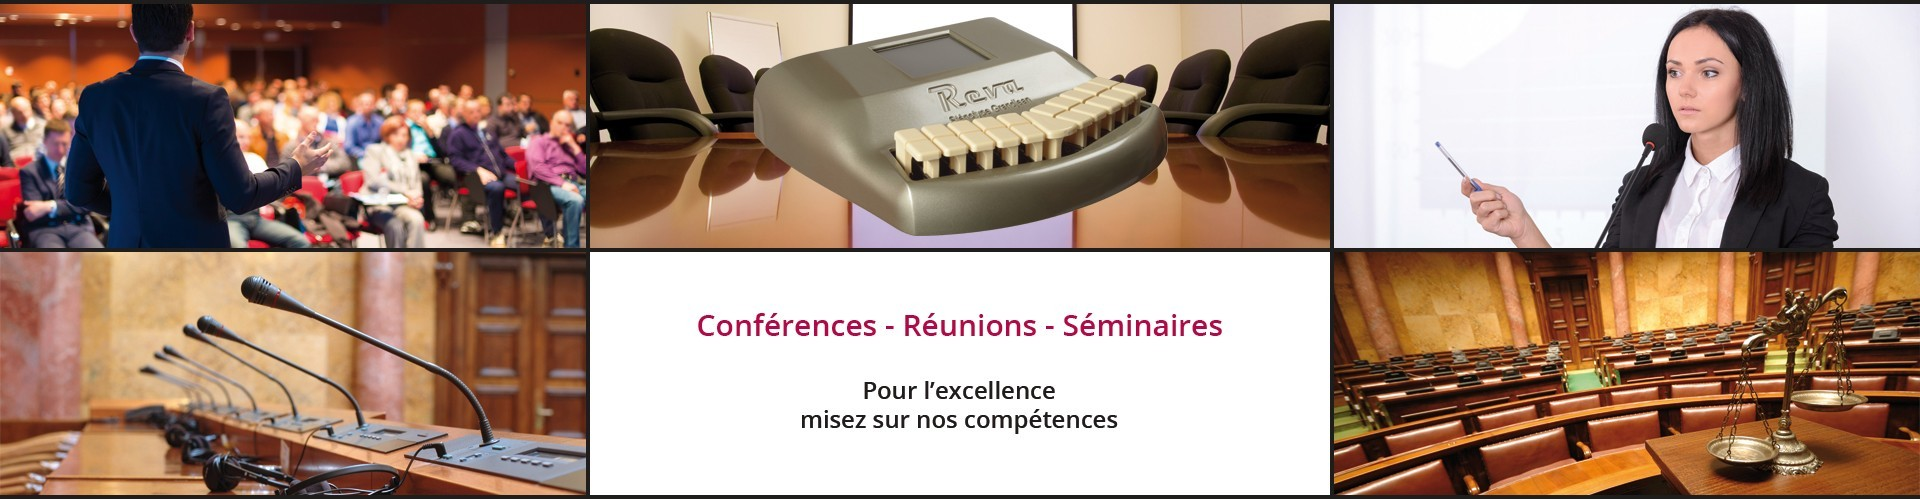 sténotypie-conference-reunion-debats